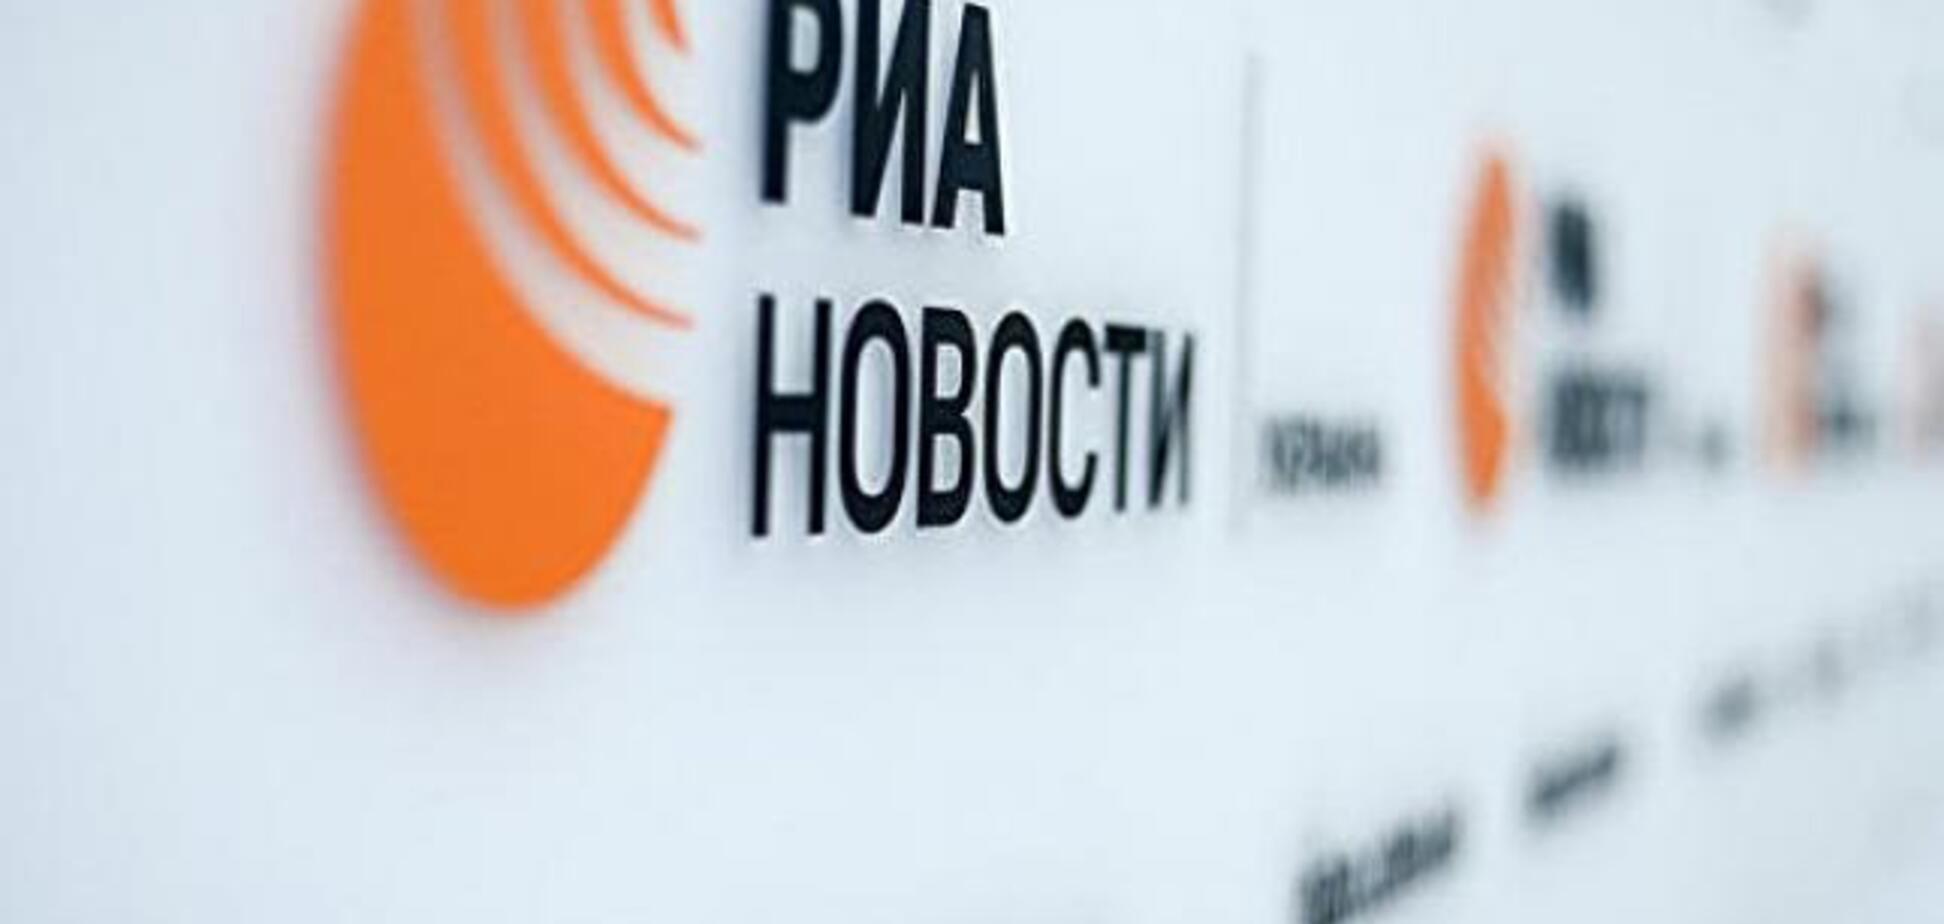 Україна ввела санкції проти 'РИА Новости'